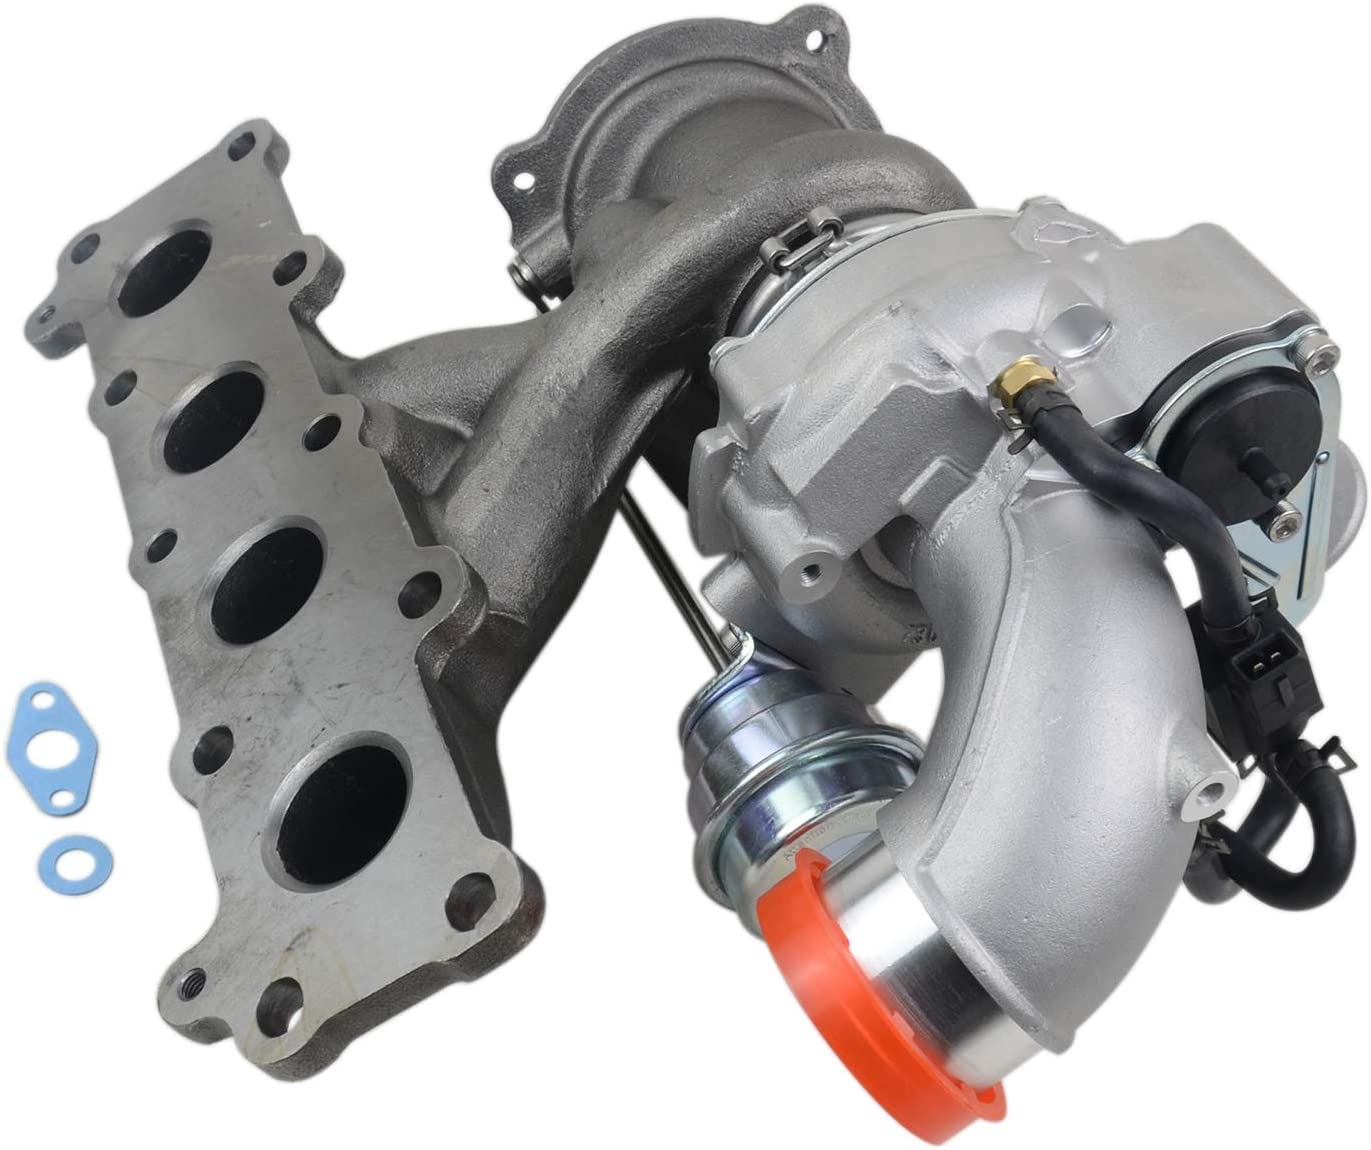 53039700288 Turbo Turbocharger for Rover 2010-2016 Max 68% OFF La-nd Evoque 2021 model